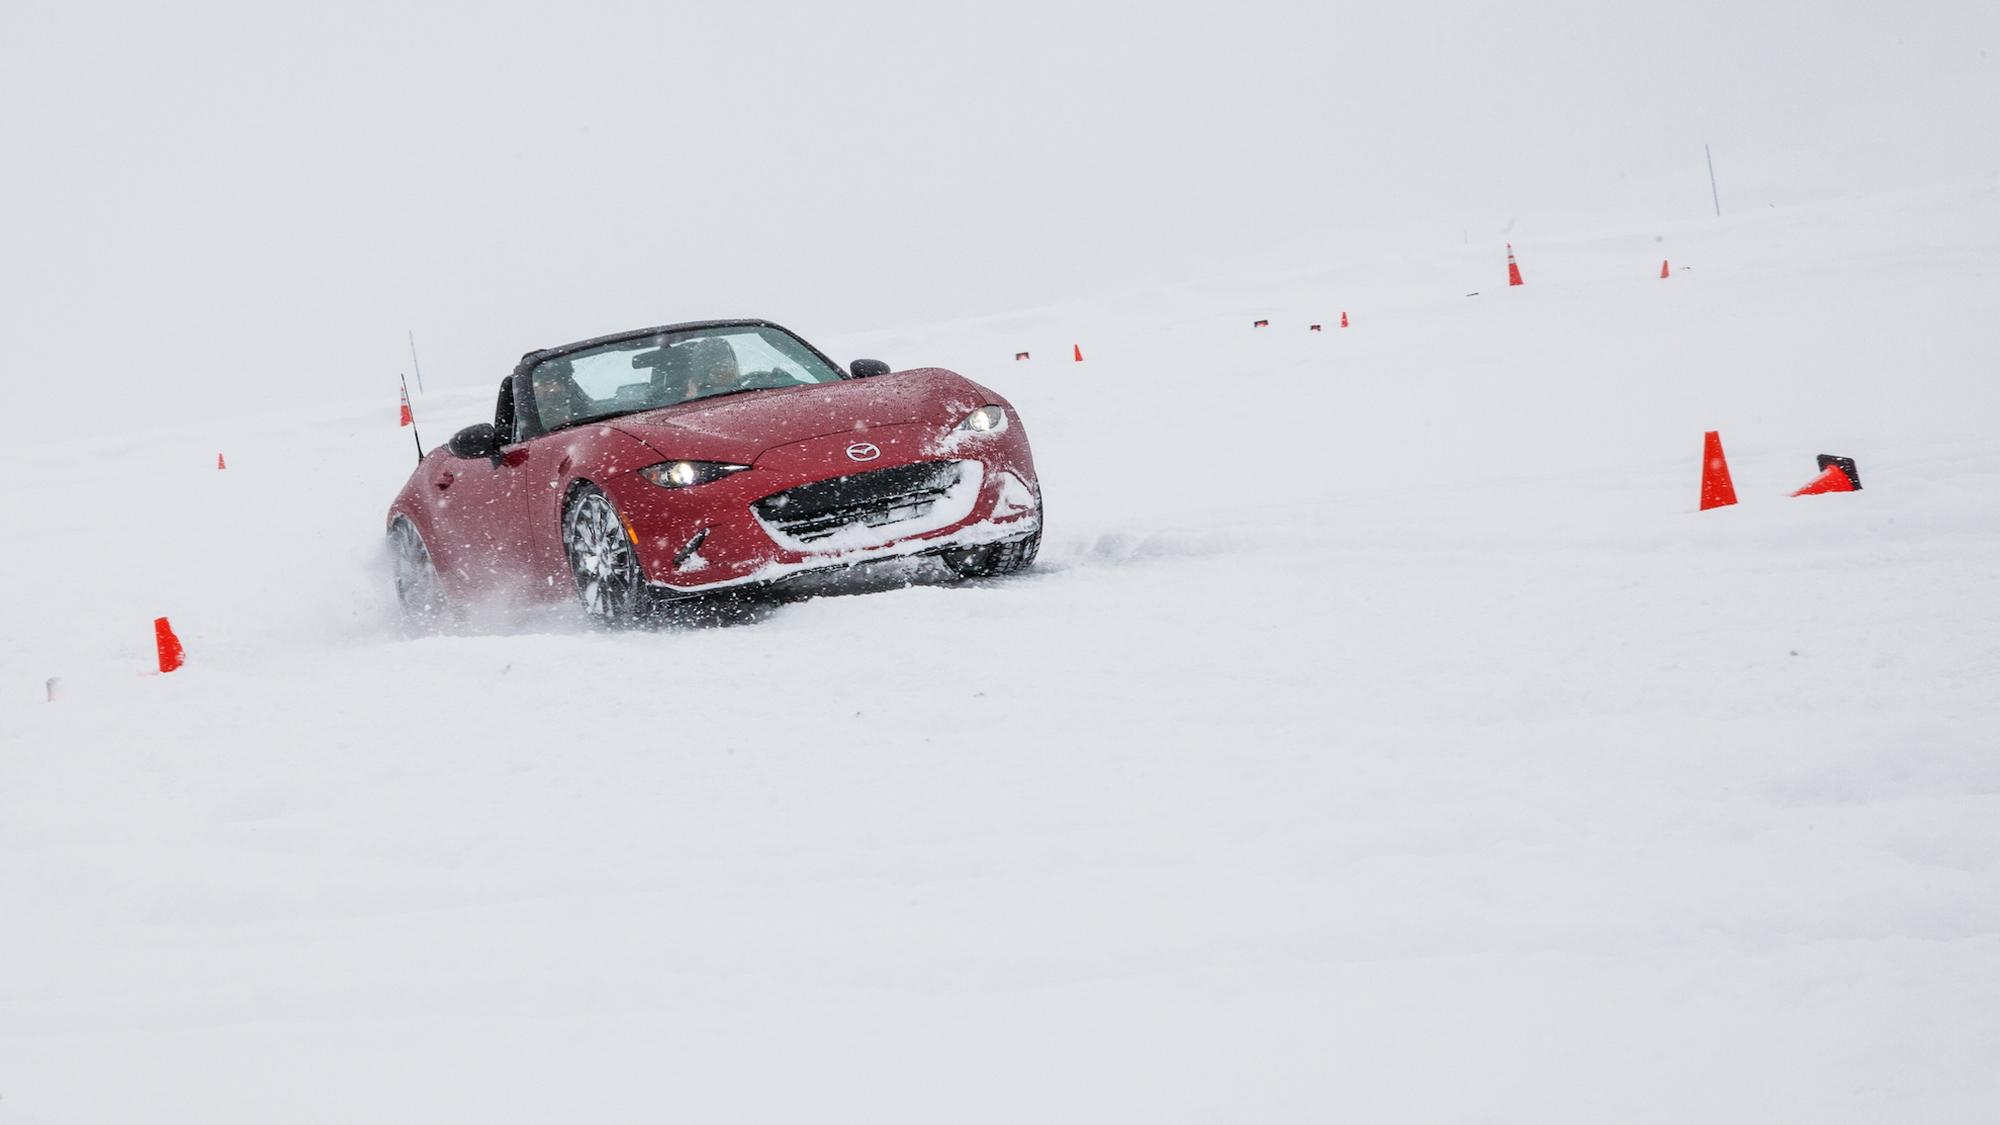 2016 Mazda MX-5 Miata, 2016 Mazda Ice Academy